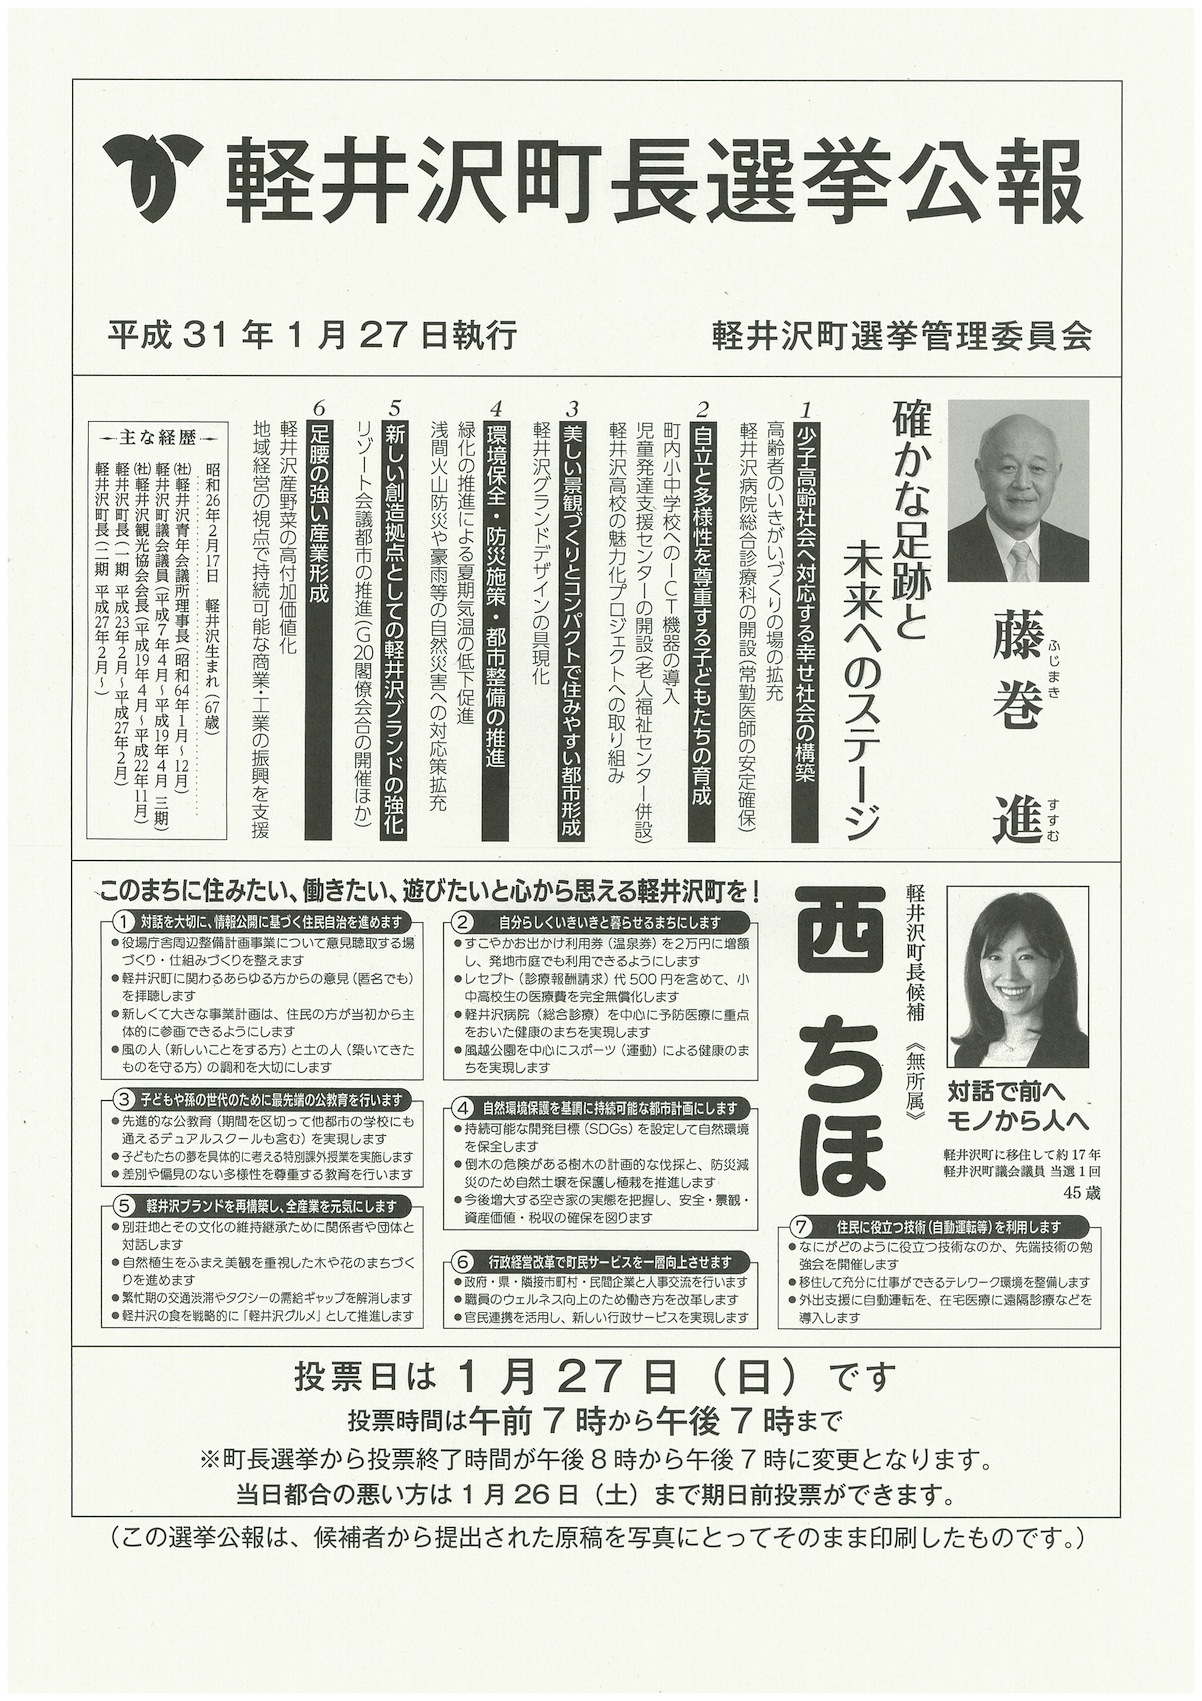 https://www.karuizawa.co.jp/editor/medias/uploads/190125_02.jpg